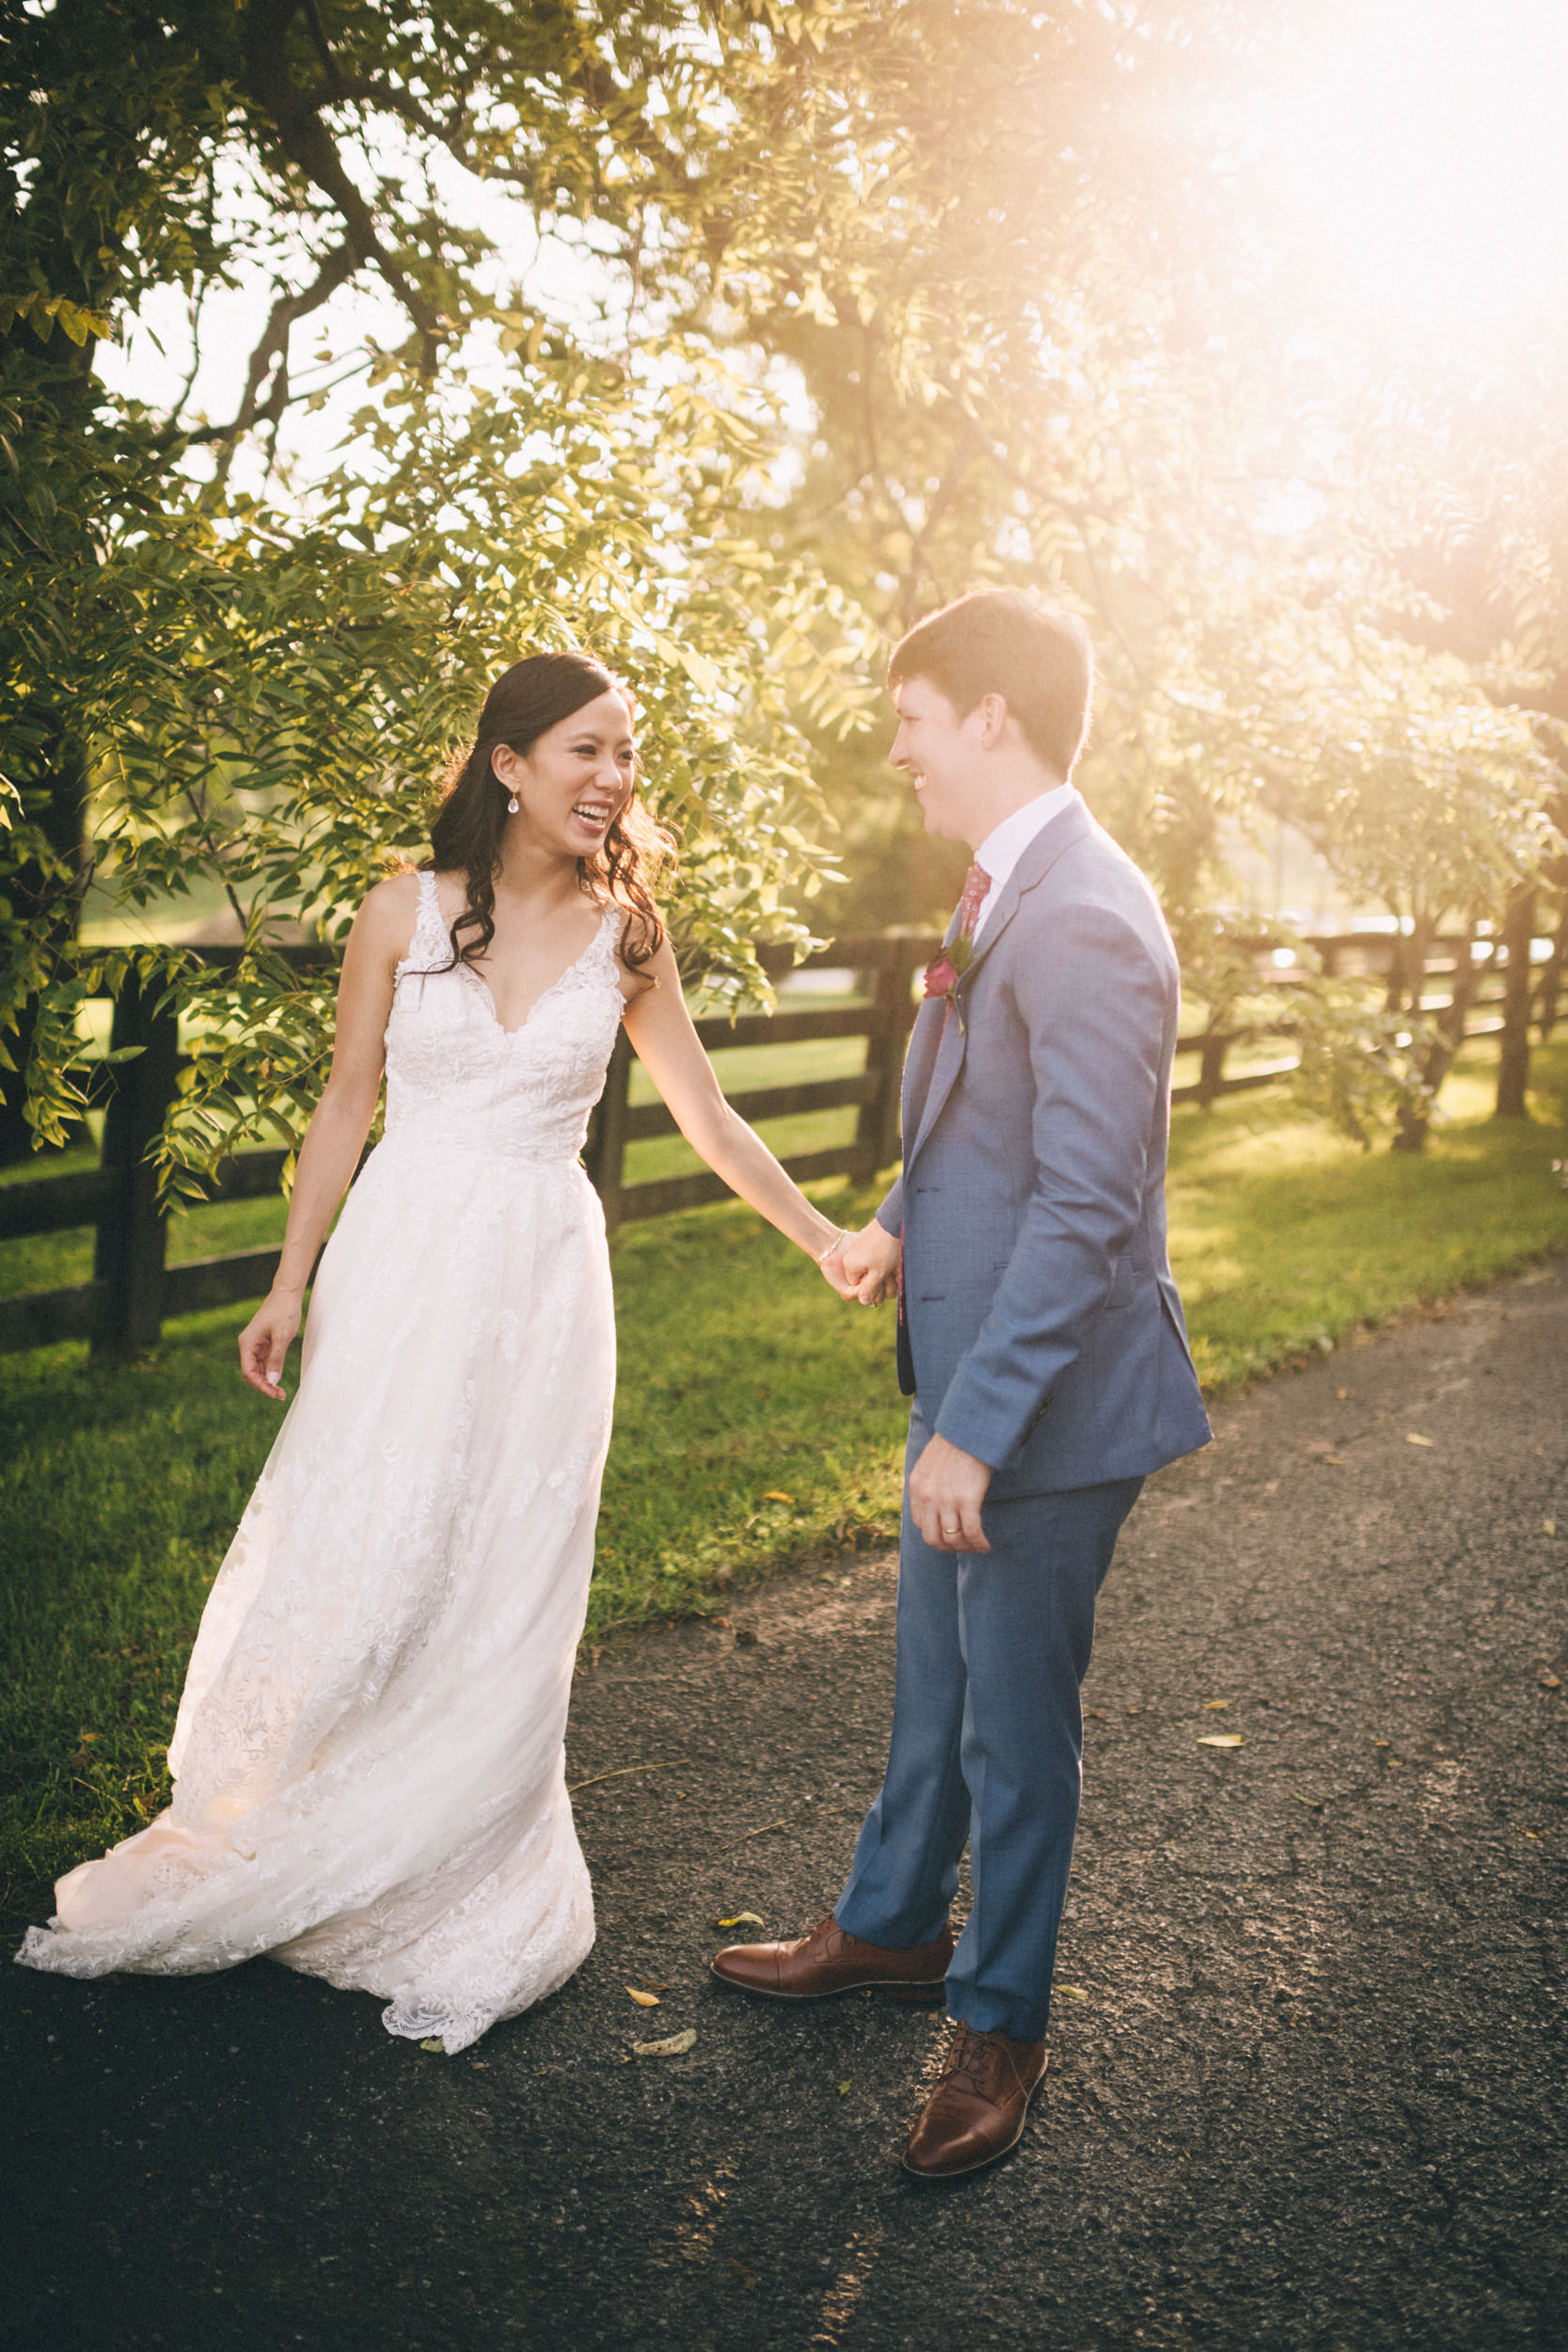 Louisville-Kentucky-Wedding-and-Elopement-Photographer-Sarah-Katherine-Davis-Photography-Summer-Jewel-Toned-Wedding-Chineese-Tea-Ceremony-Warrenwood-Manor-Danville-662.jpg